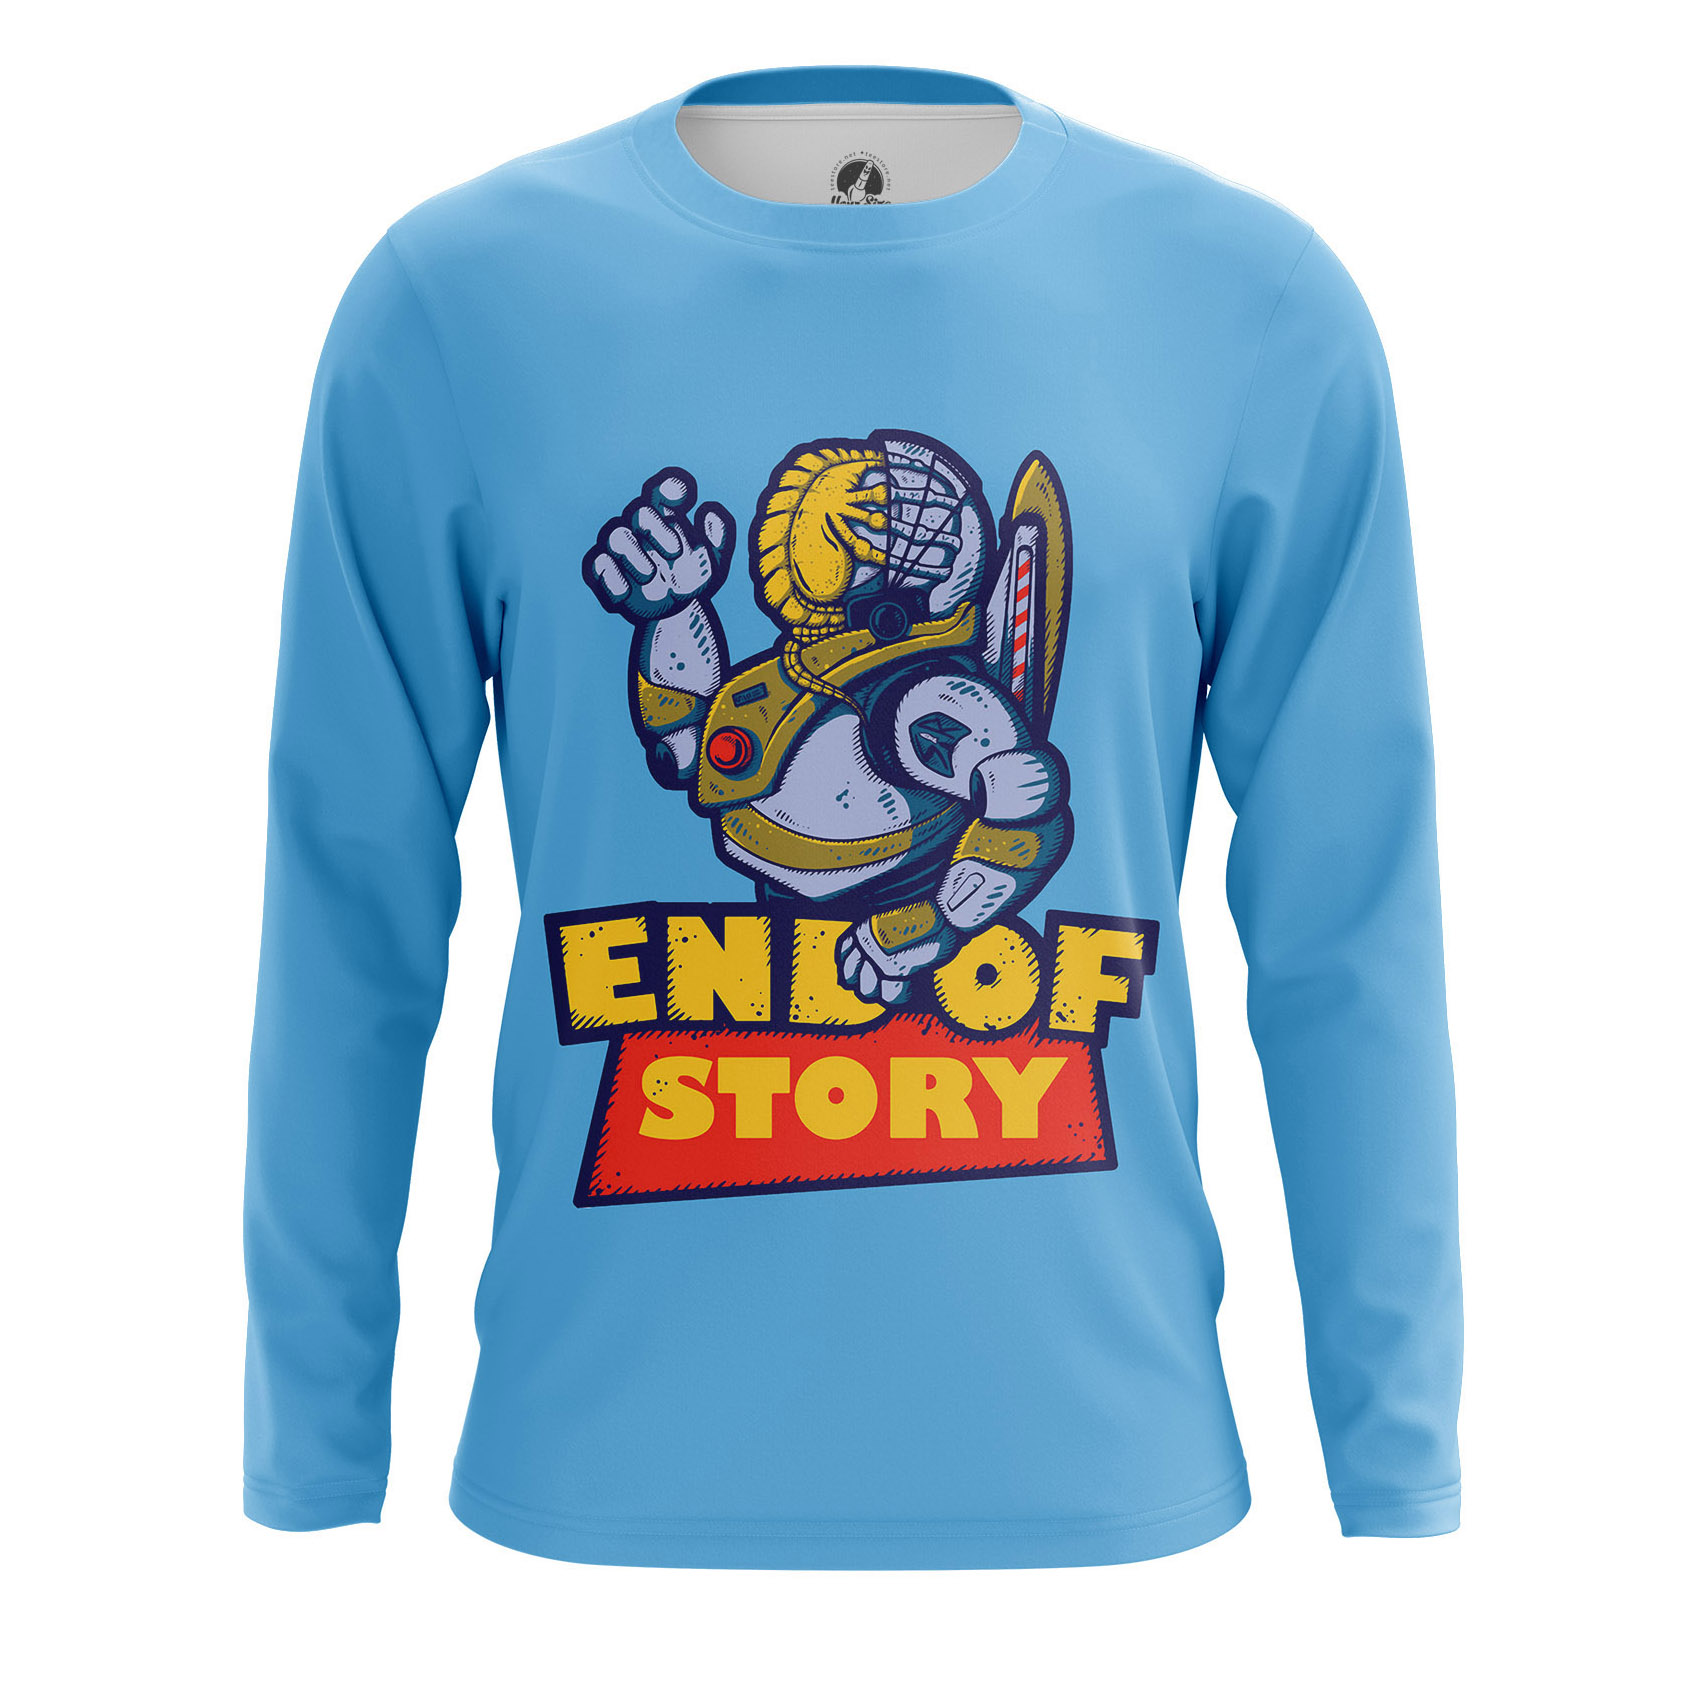 - M Lon Endofstory 1482275310 229